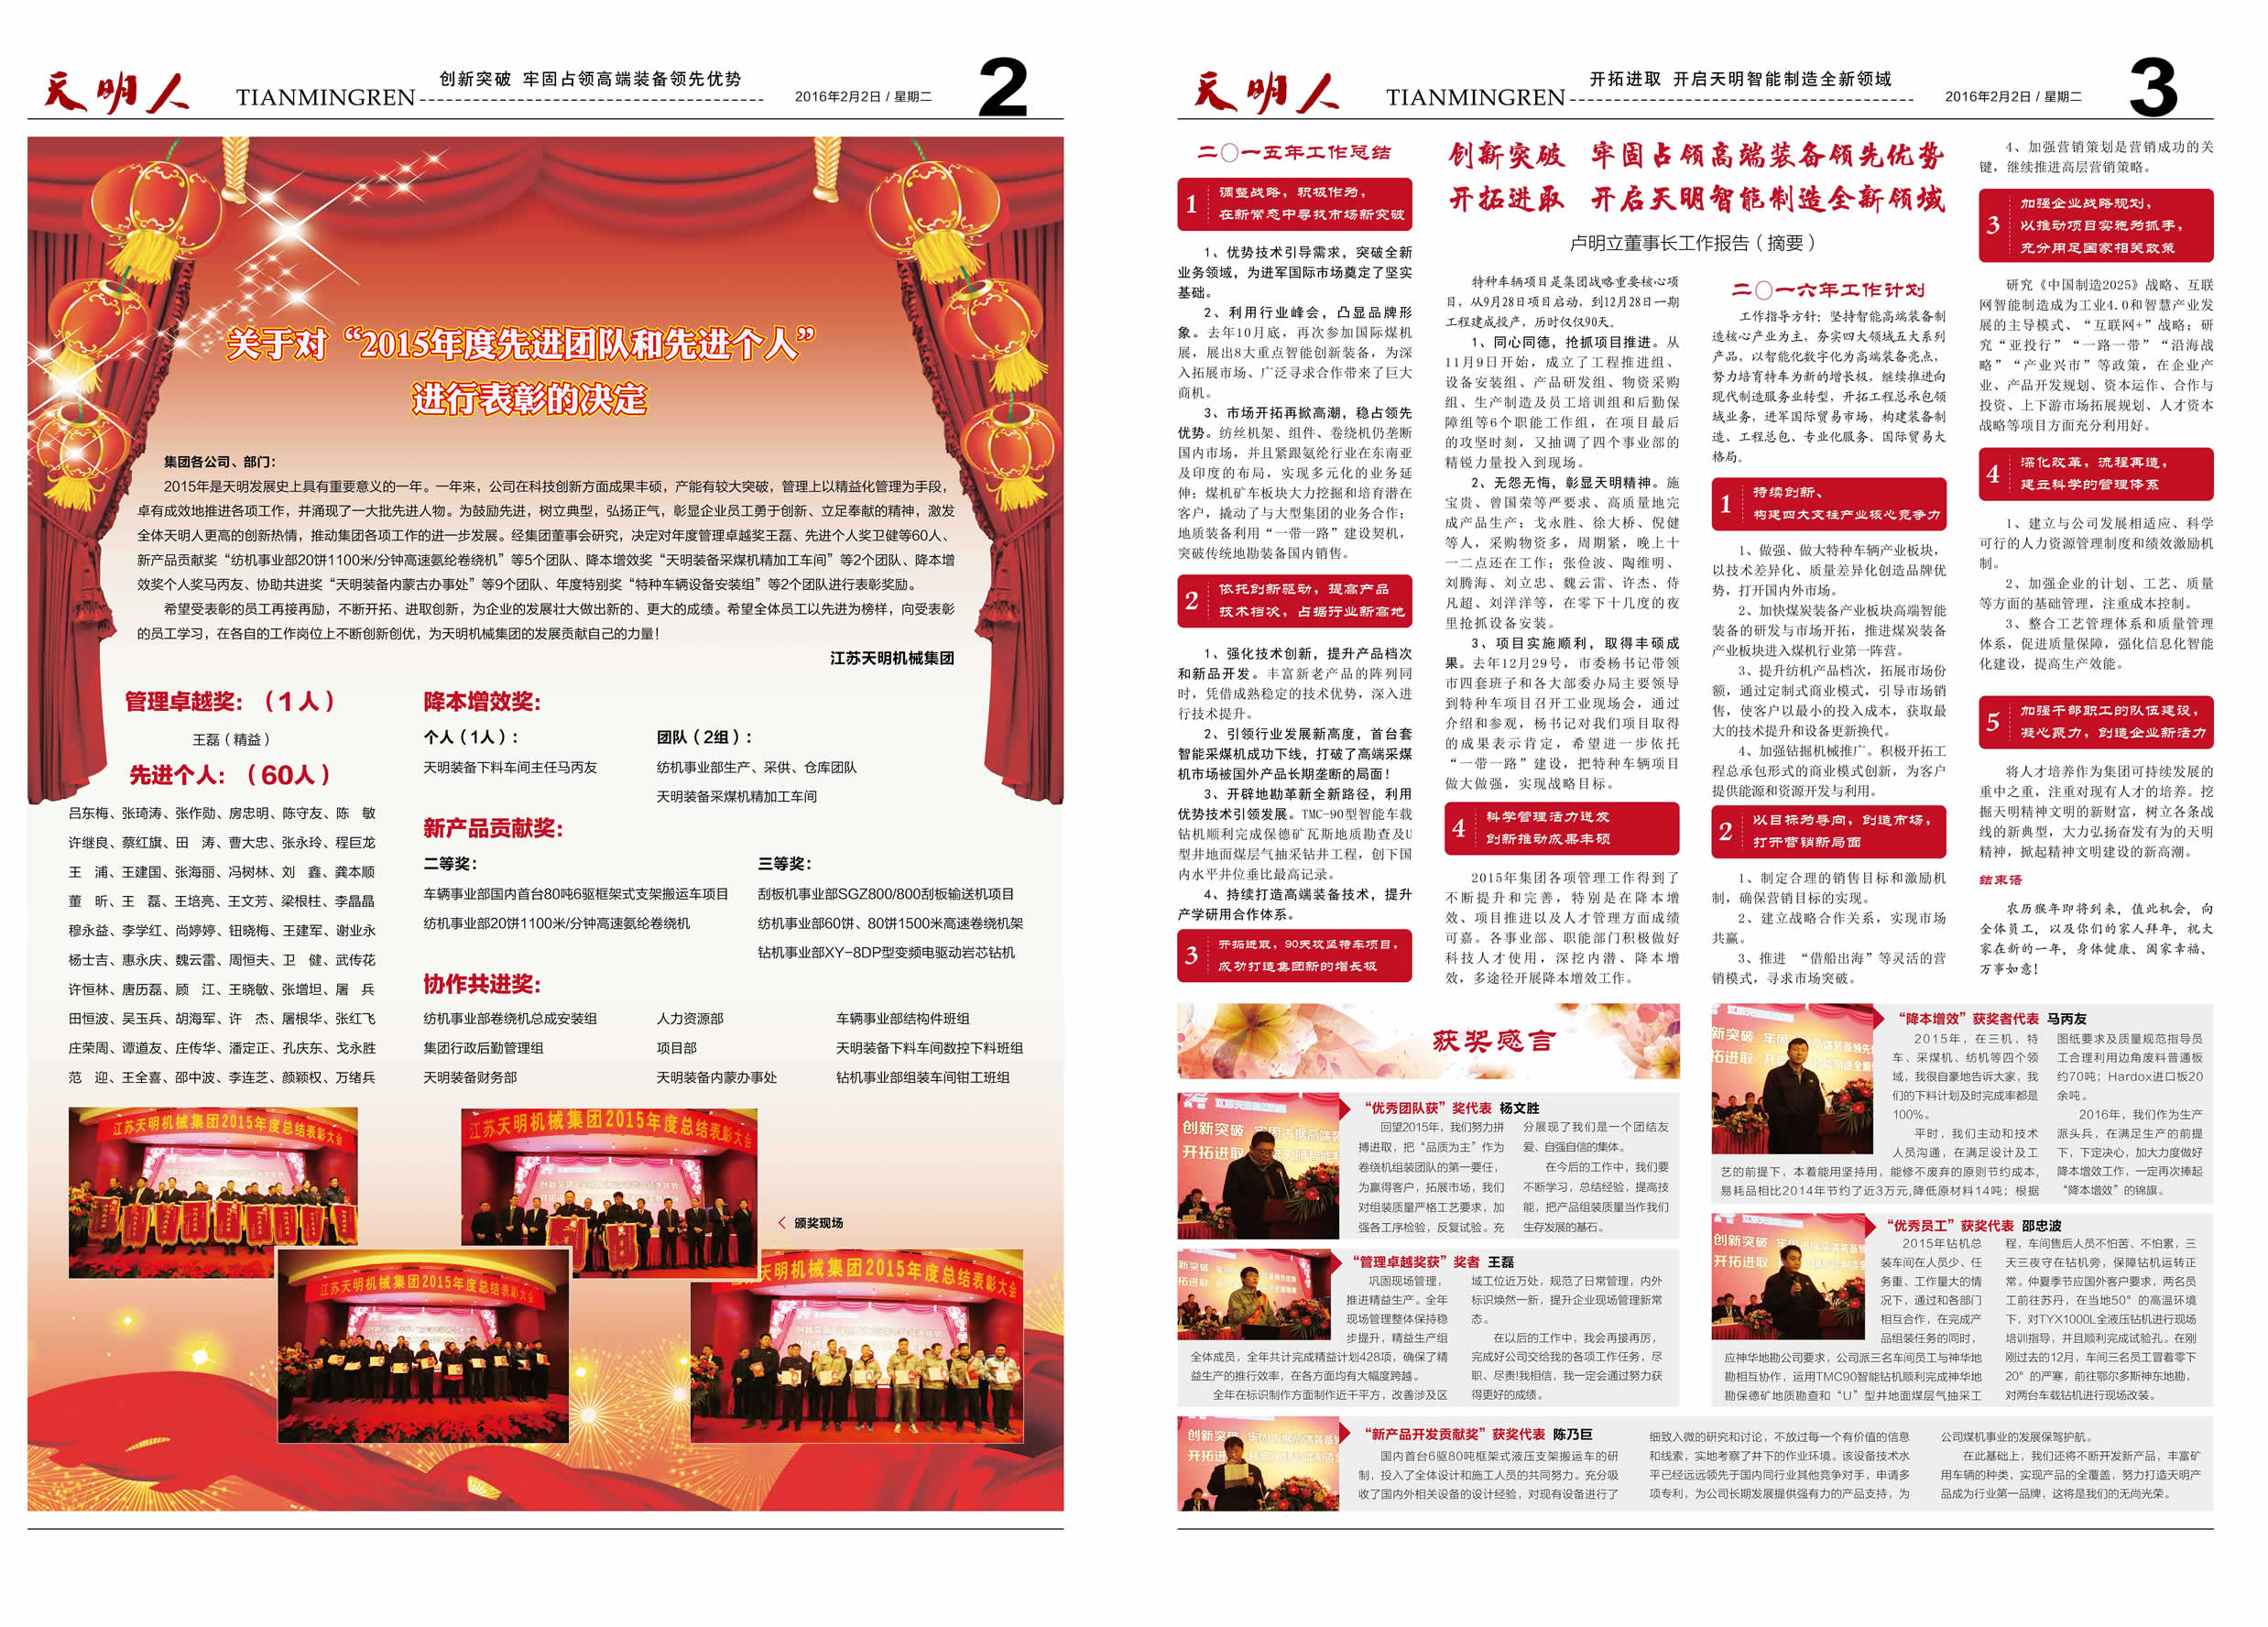 hg711皇冠国际_hg88皇冠国际平台_hg皇冠国际vip首页人2016第02期(总第98期)2、3版